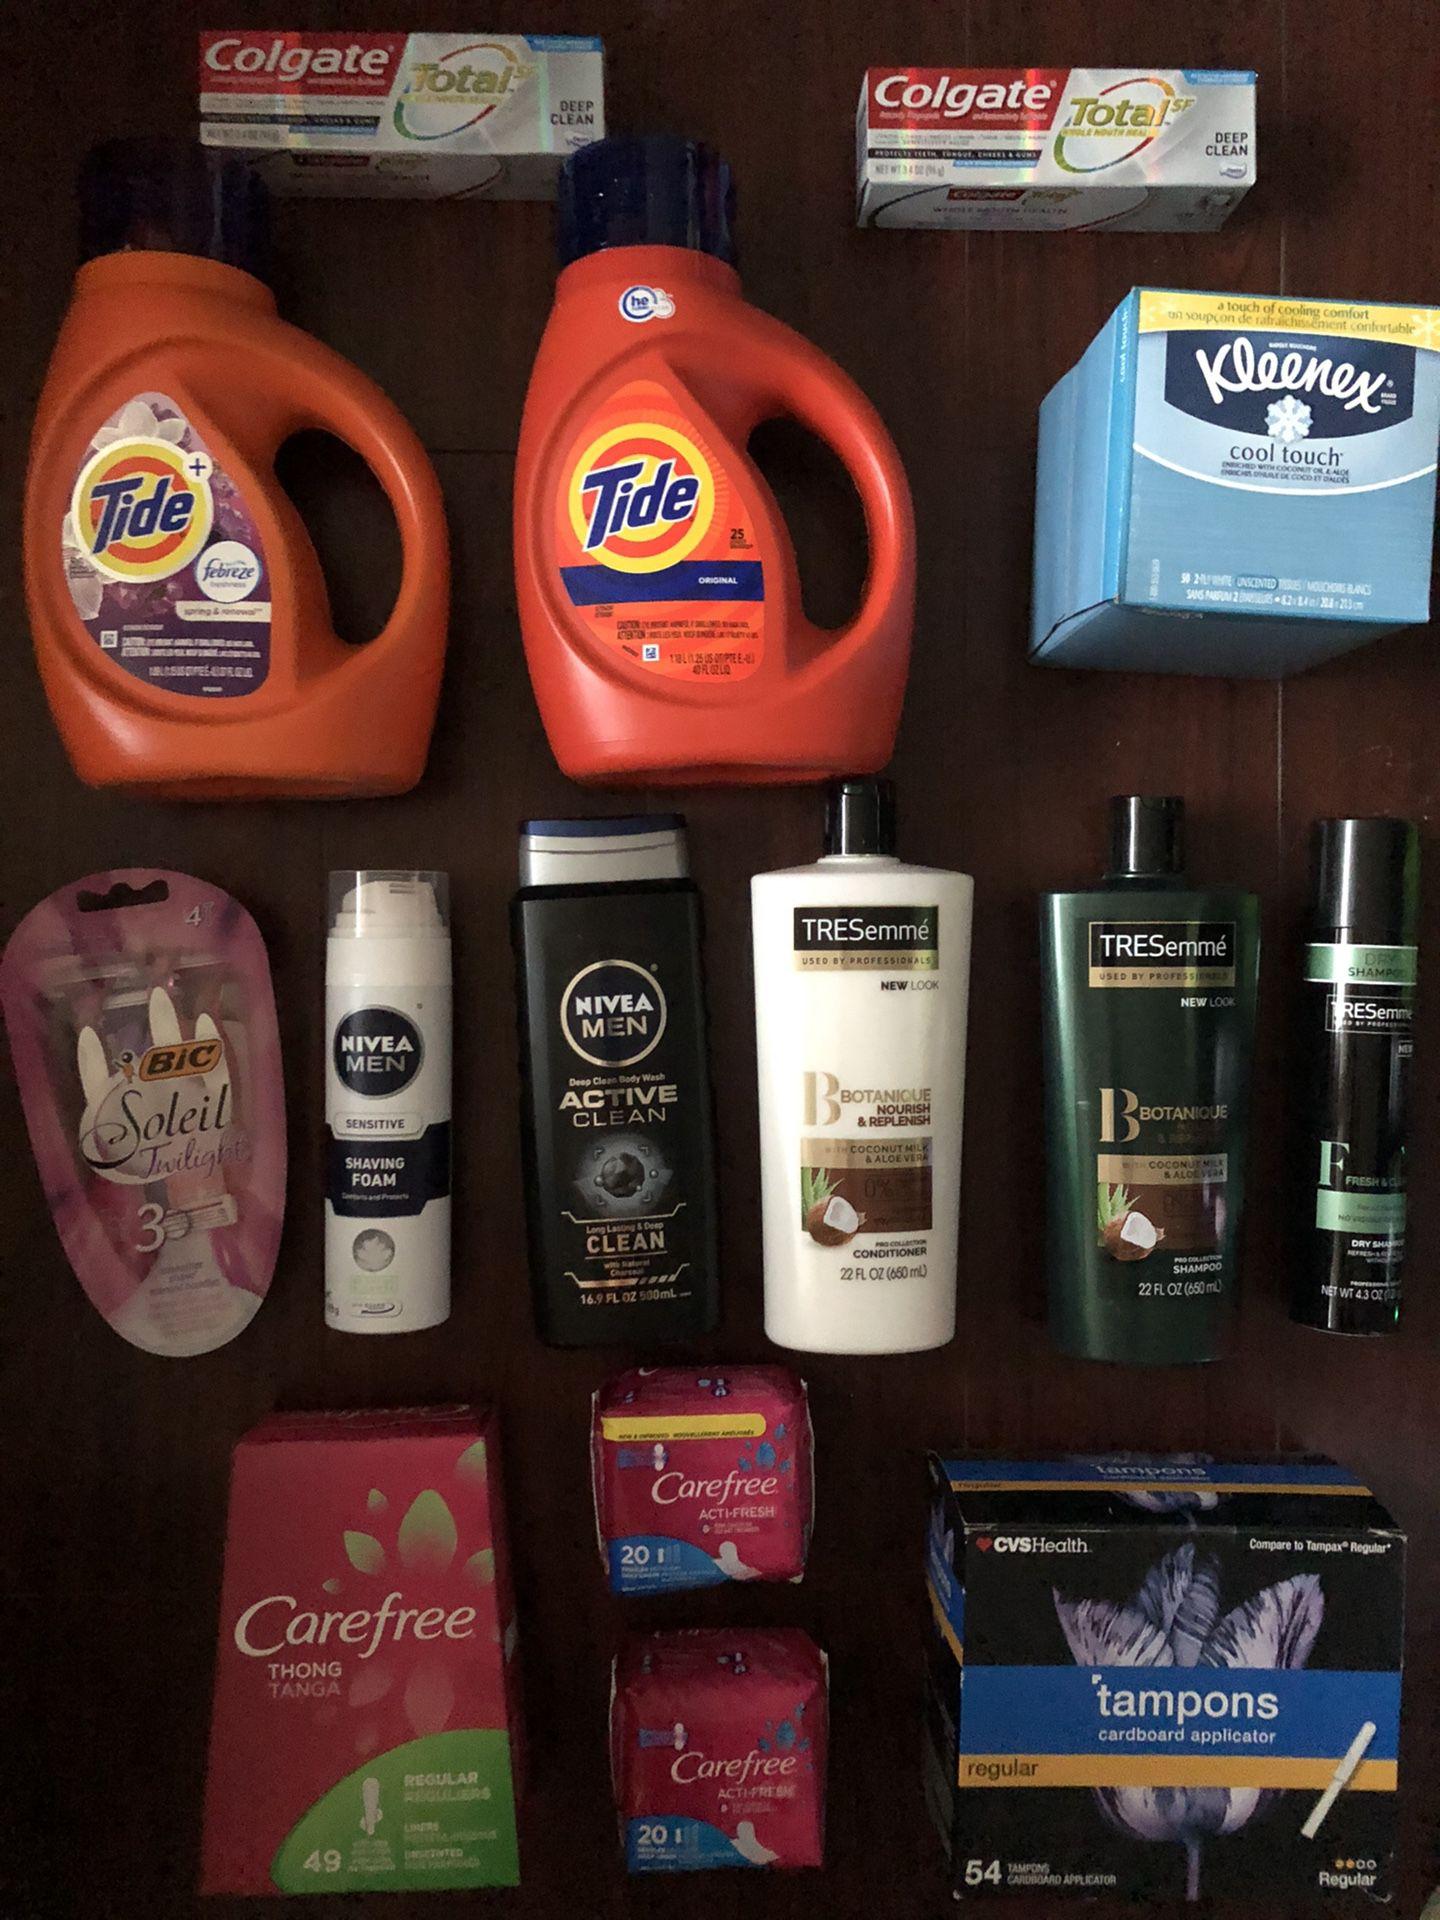 2 Tide; 1 Tampons (50ct); 3 Carefree; 3 Tresemme; 2 Nivea: Body wash & Shave Gel; 1 Bic Razors; 1 Kleenex; 2 Toothpastes: $60